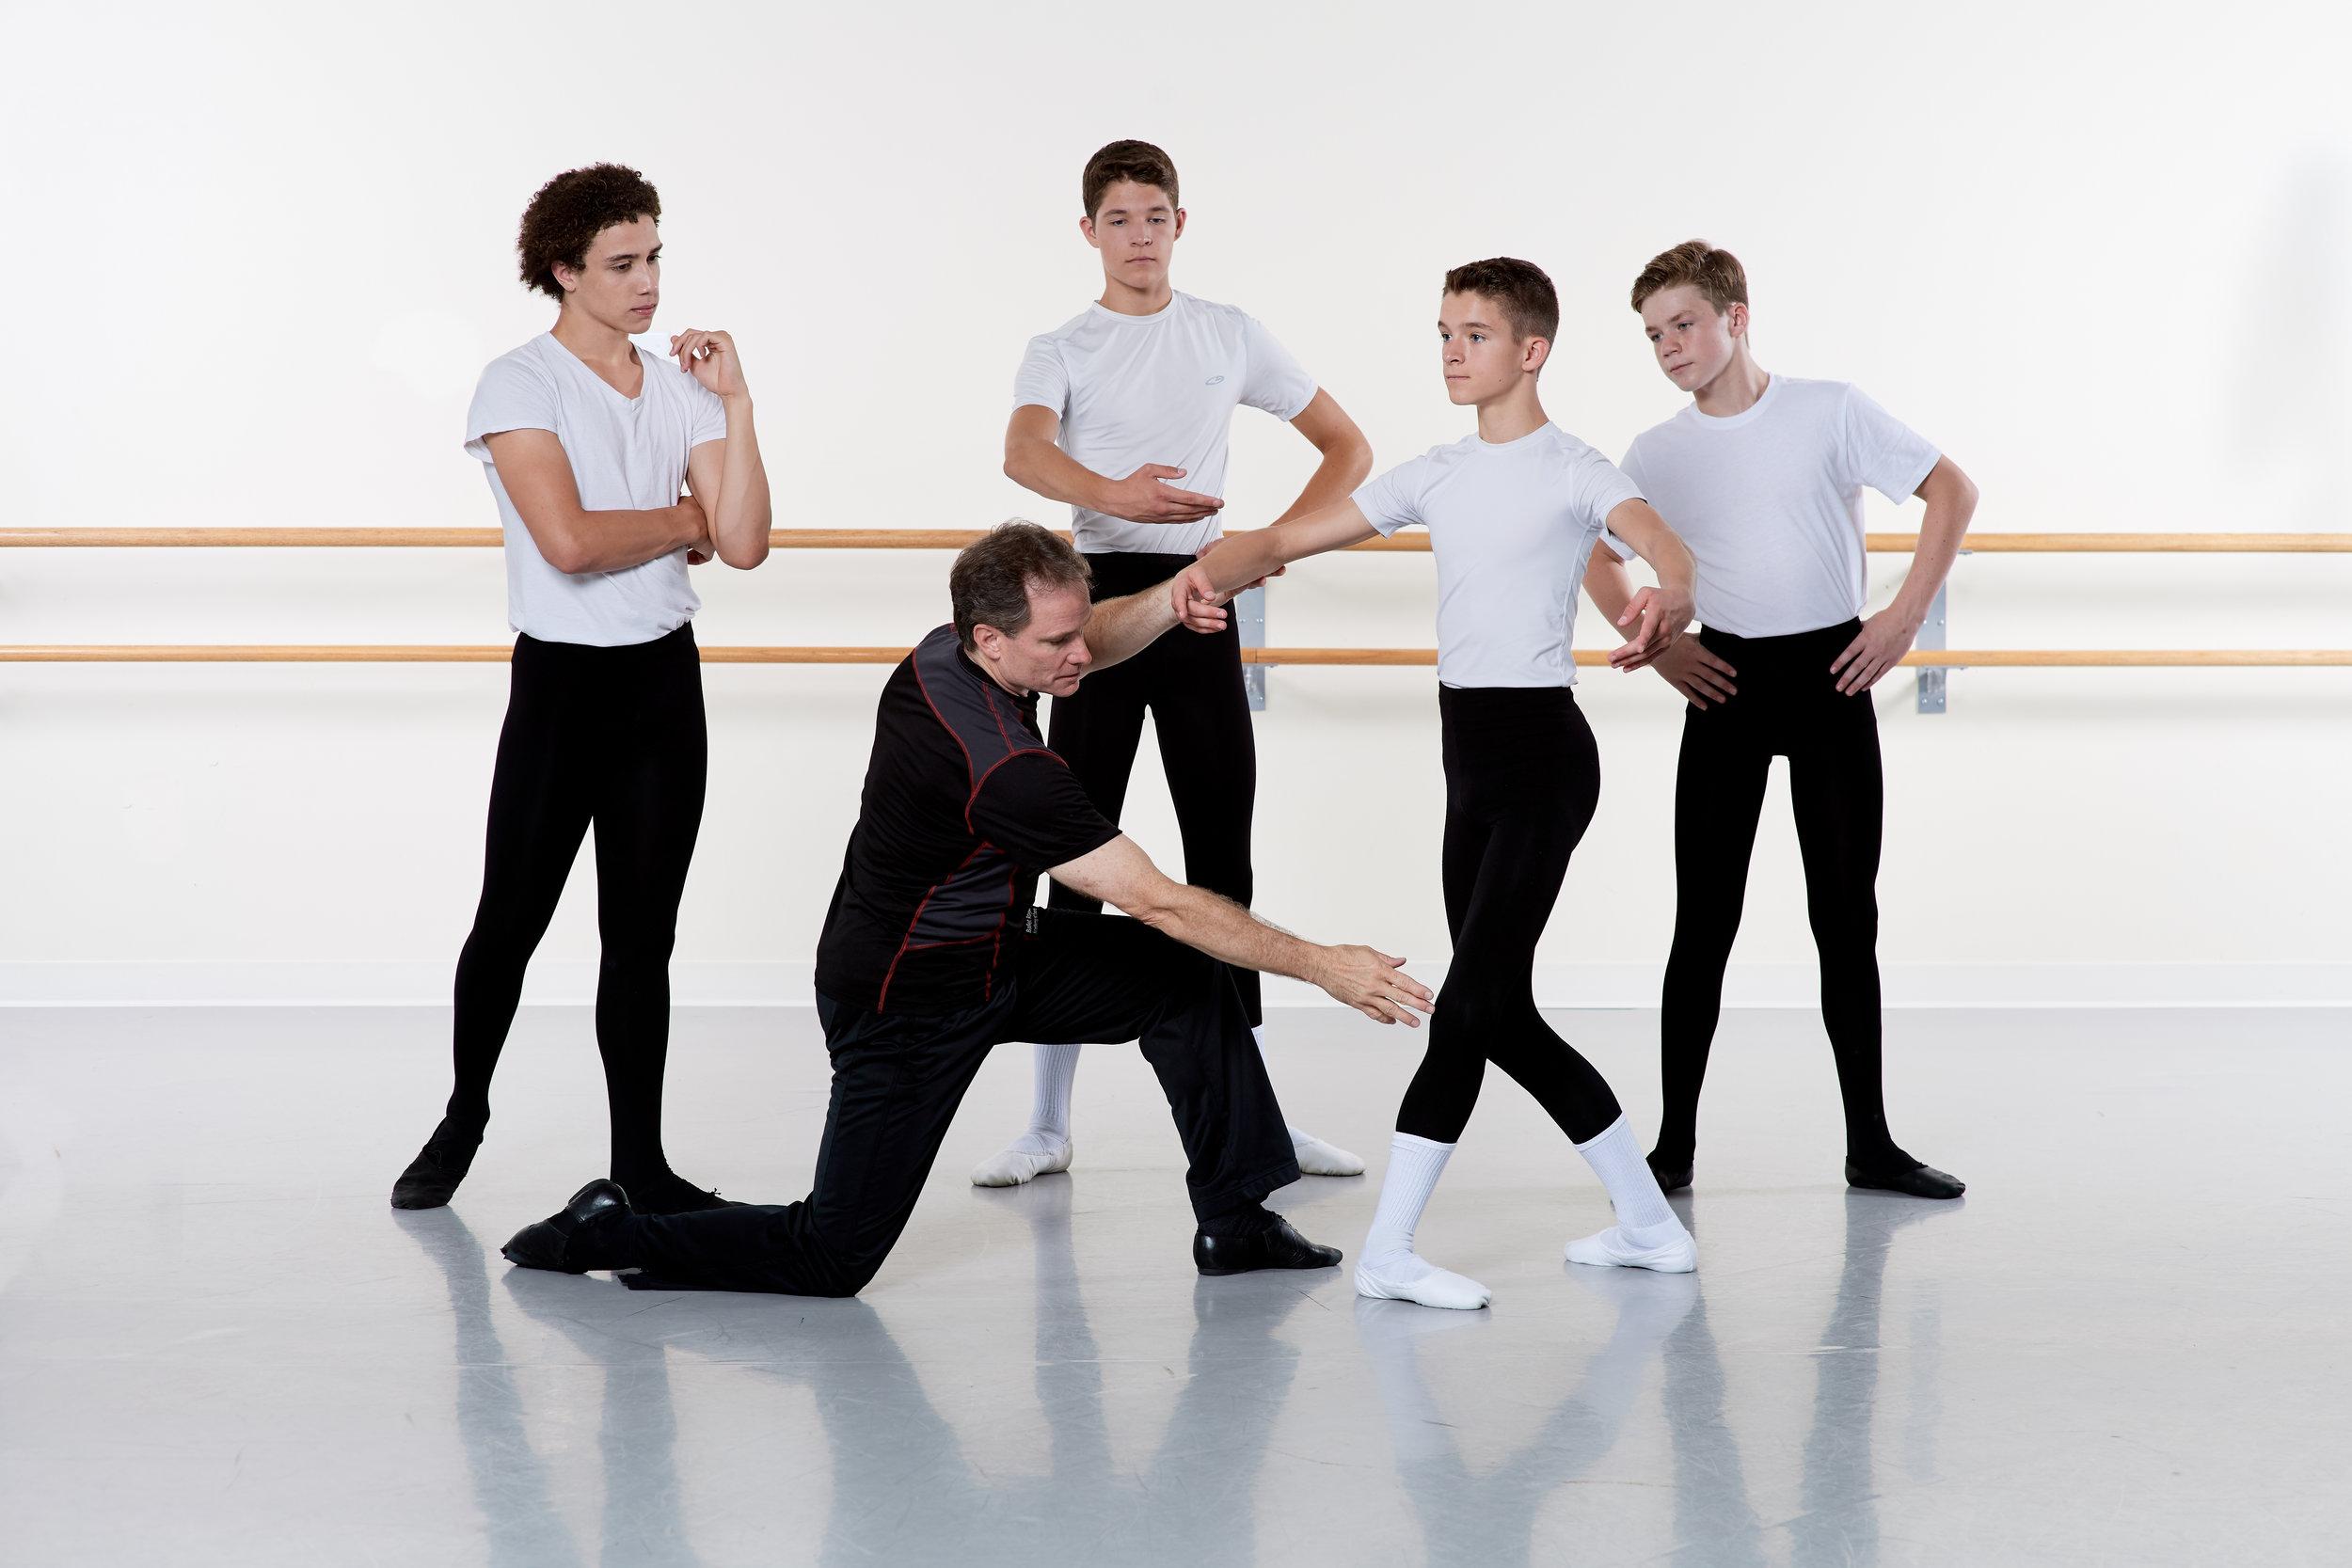 Boy's/Men's Ballet Intensives and Programs - Ages 10 +